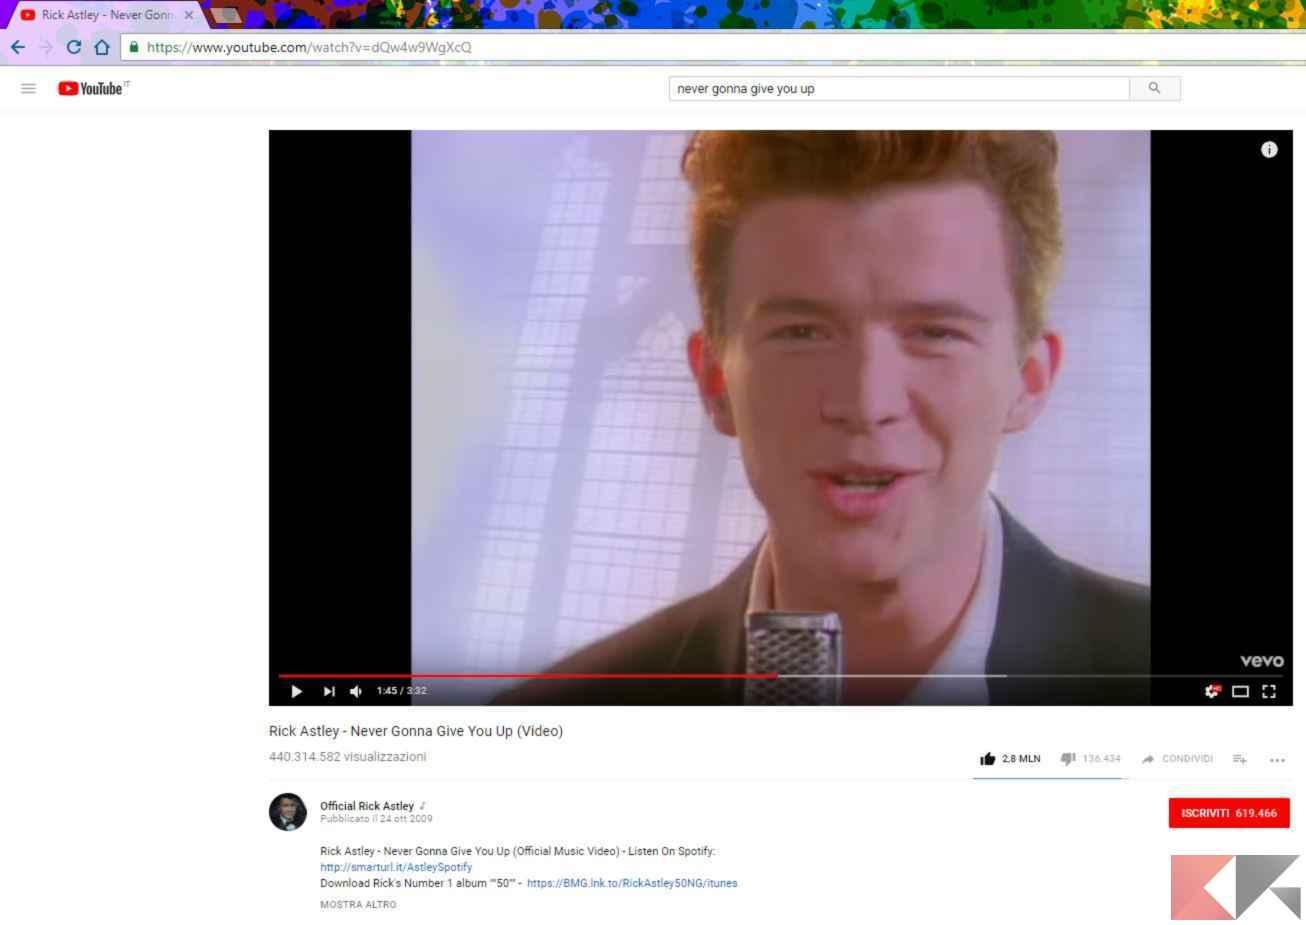 scaricare video da internet